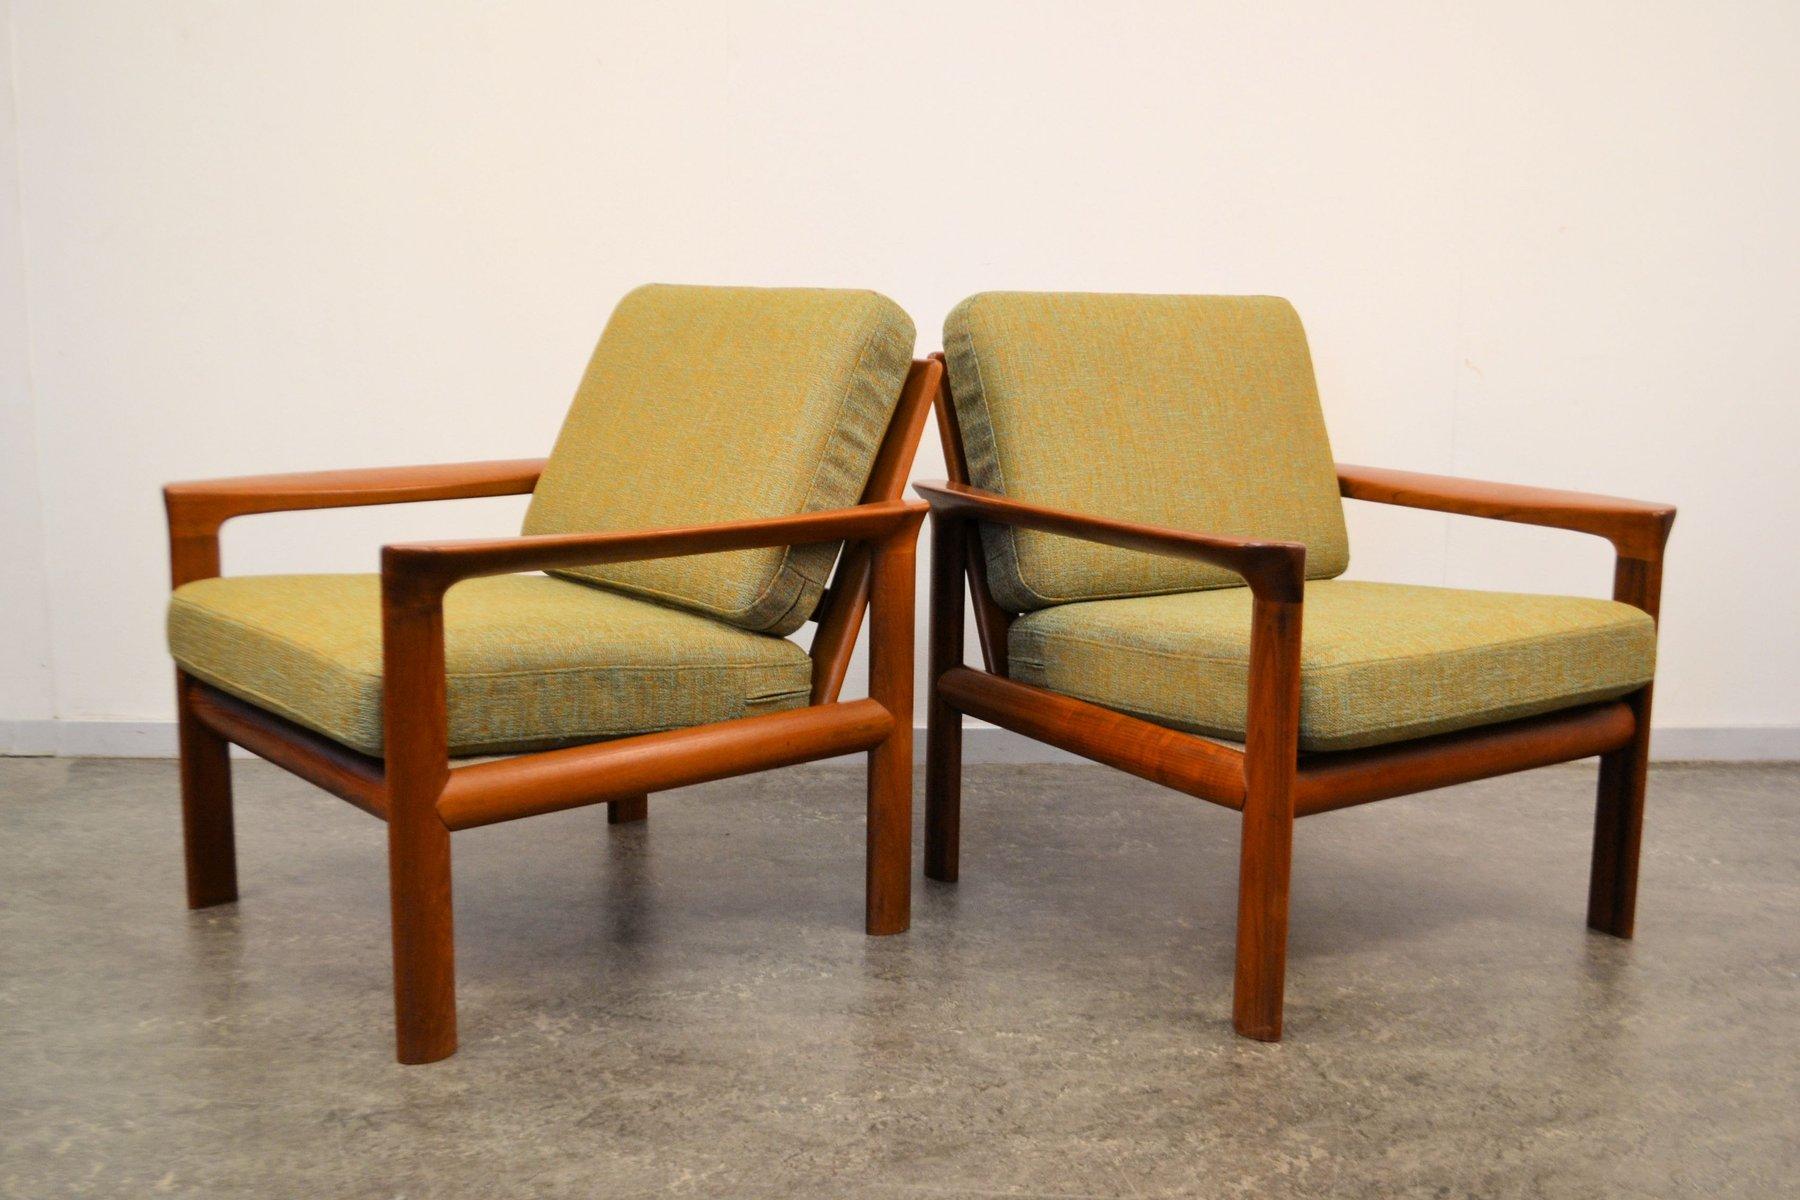 Teak Lounge Chairs By Sven Ellekaer, Set Of 2